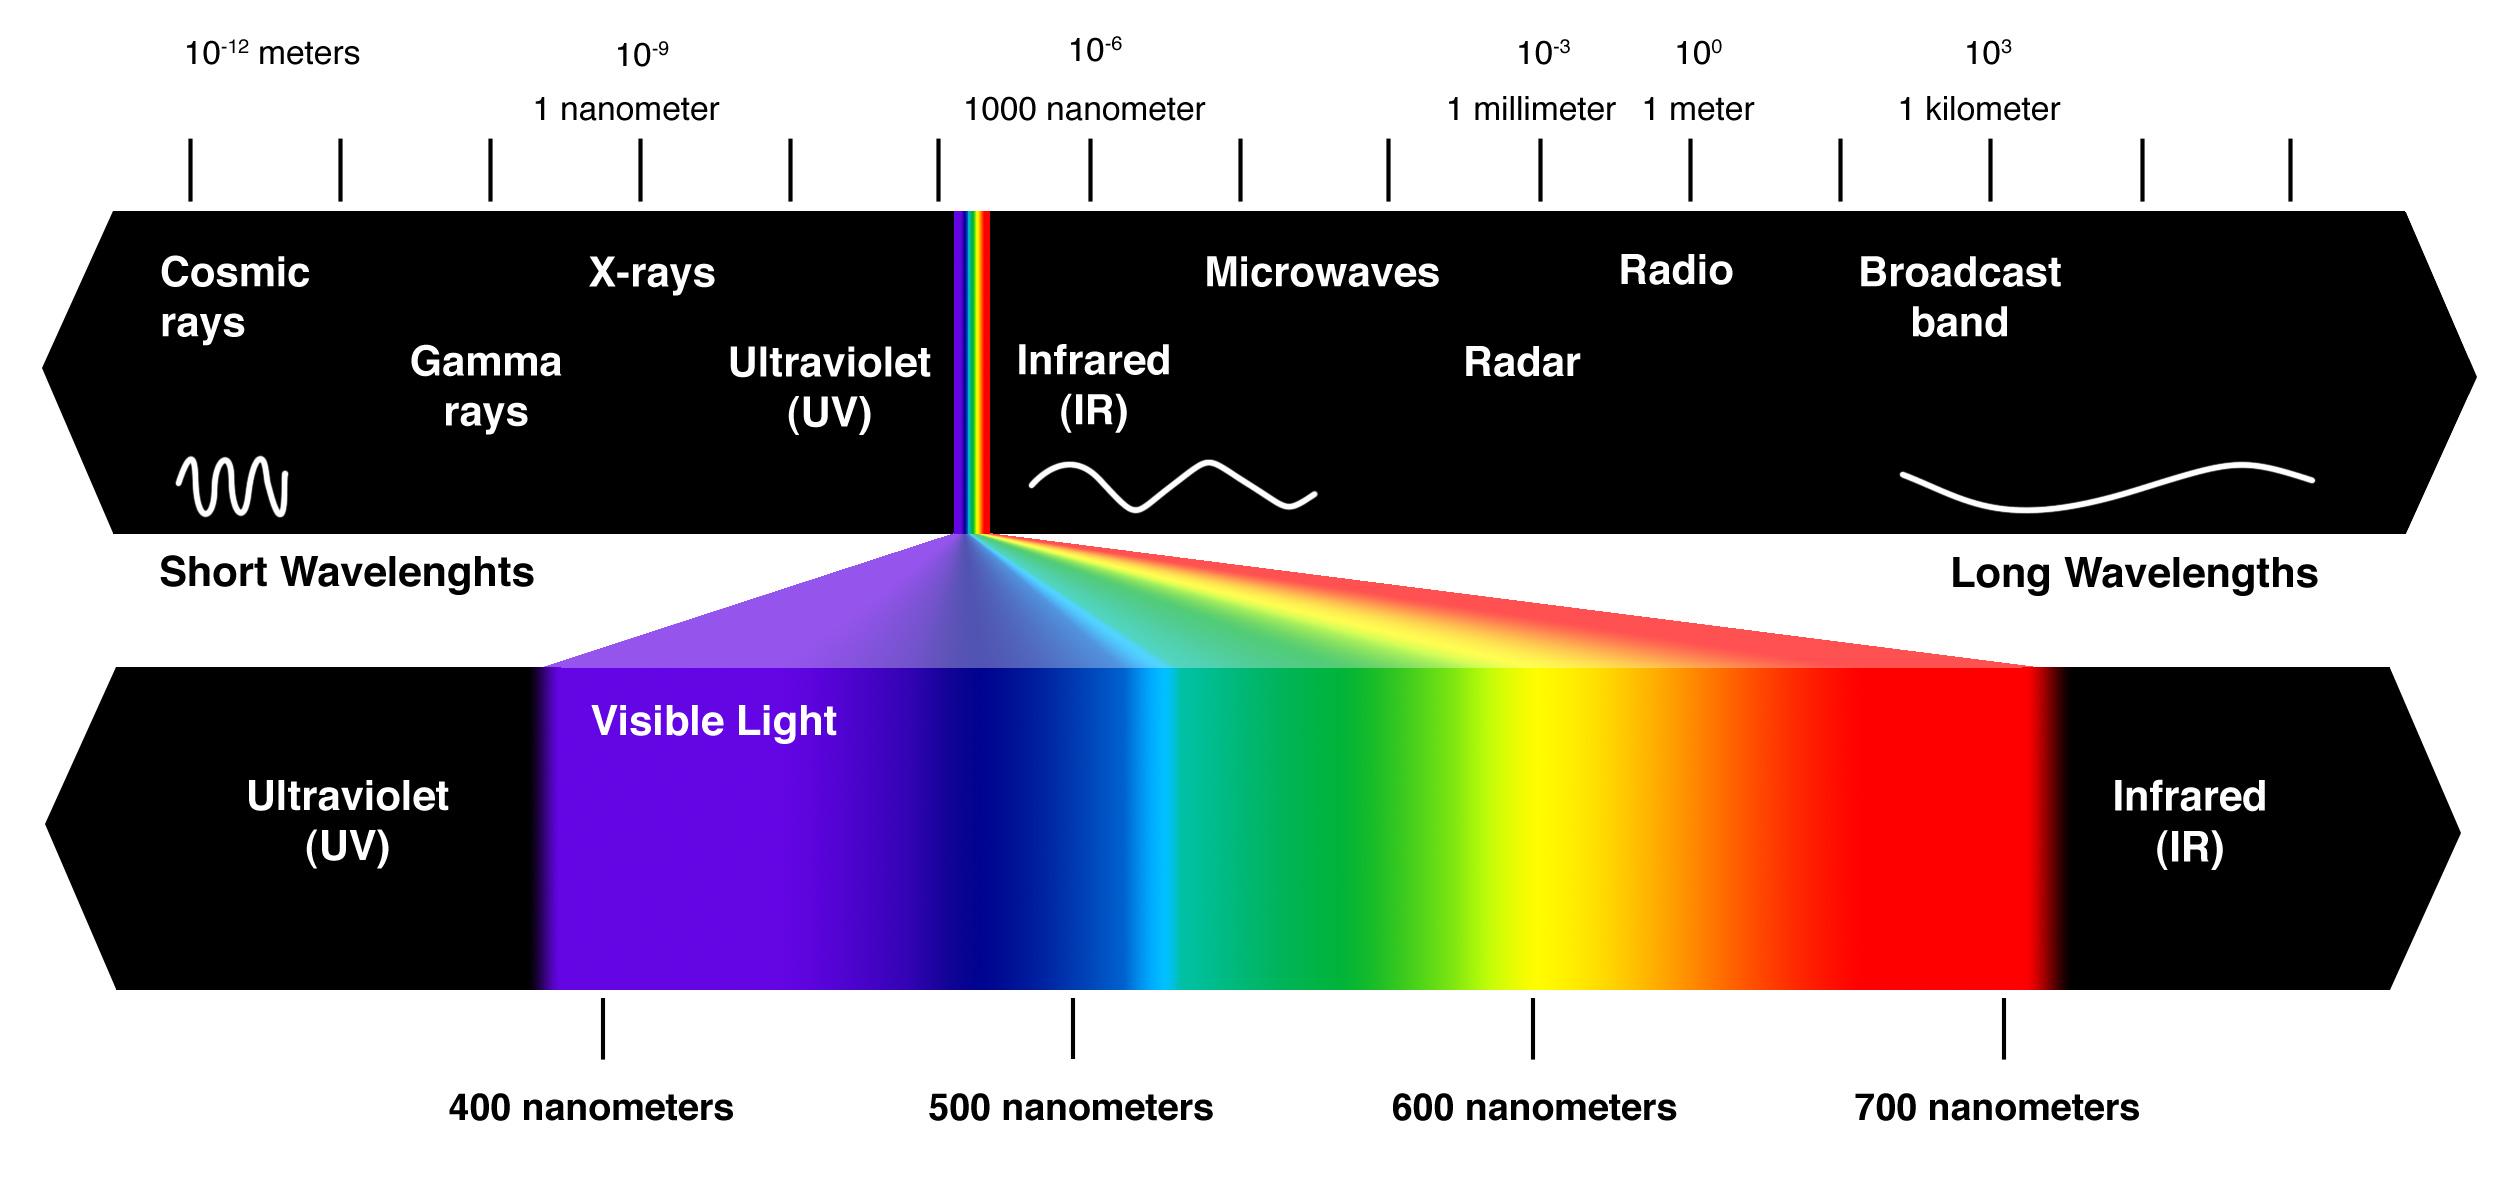 https://www.quora.com/How-do-color-filters-alter-the-wavelength-of-light